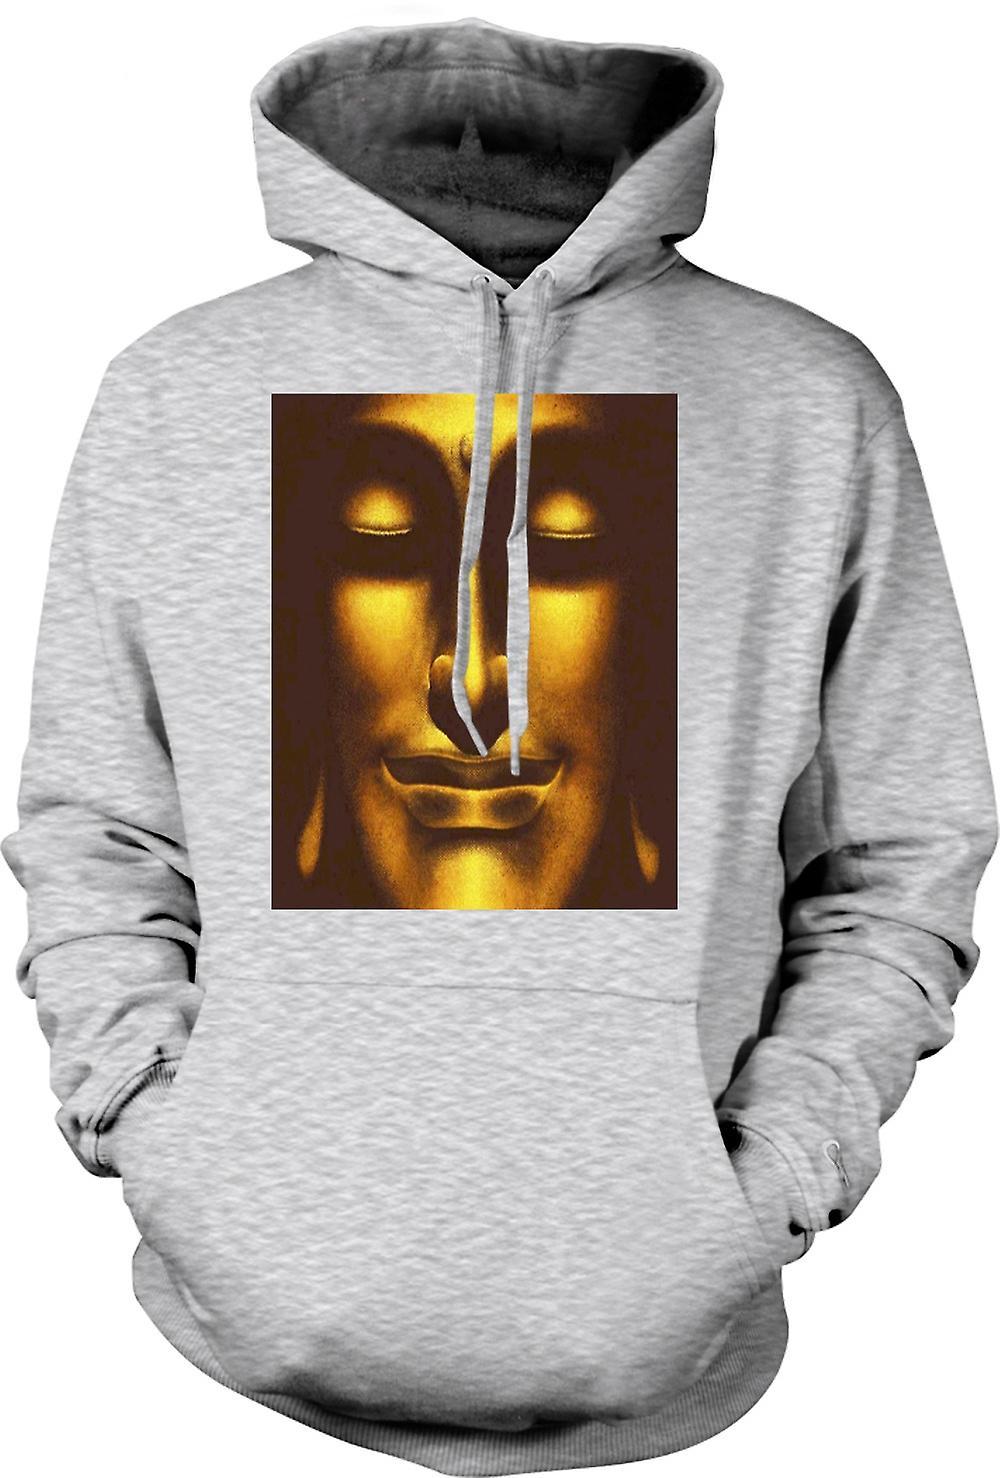 Mens Hoodie - Thai Golden Buddha